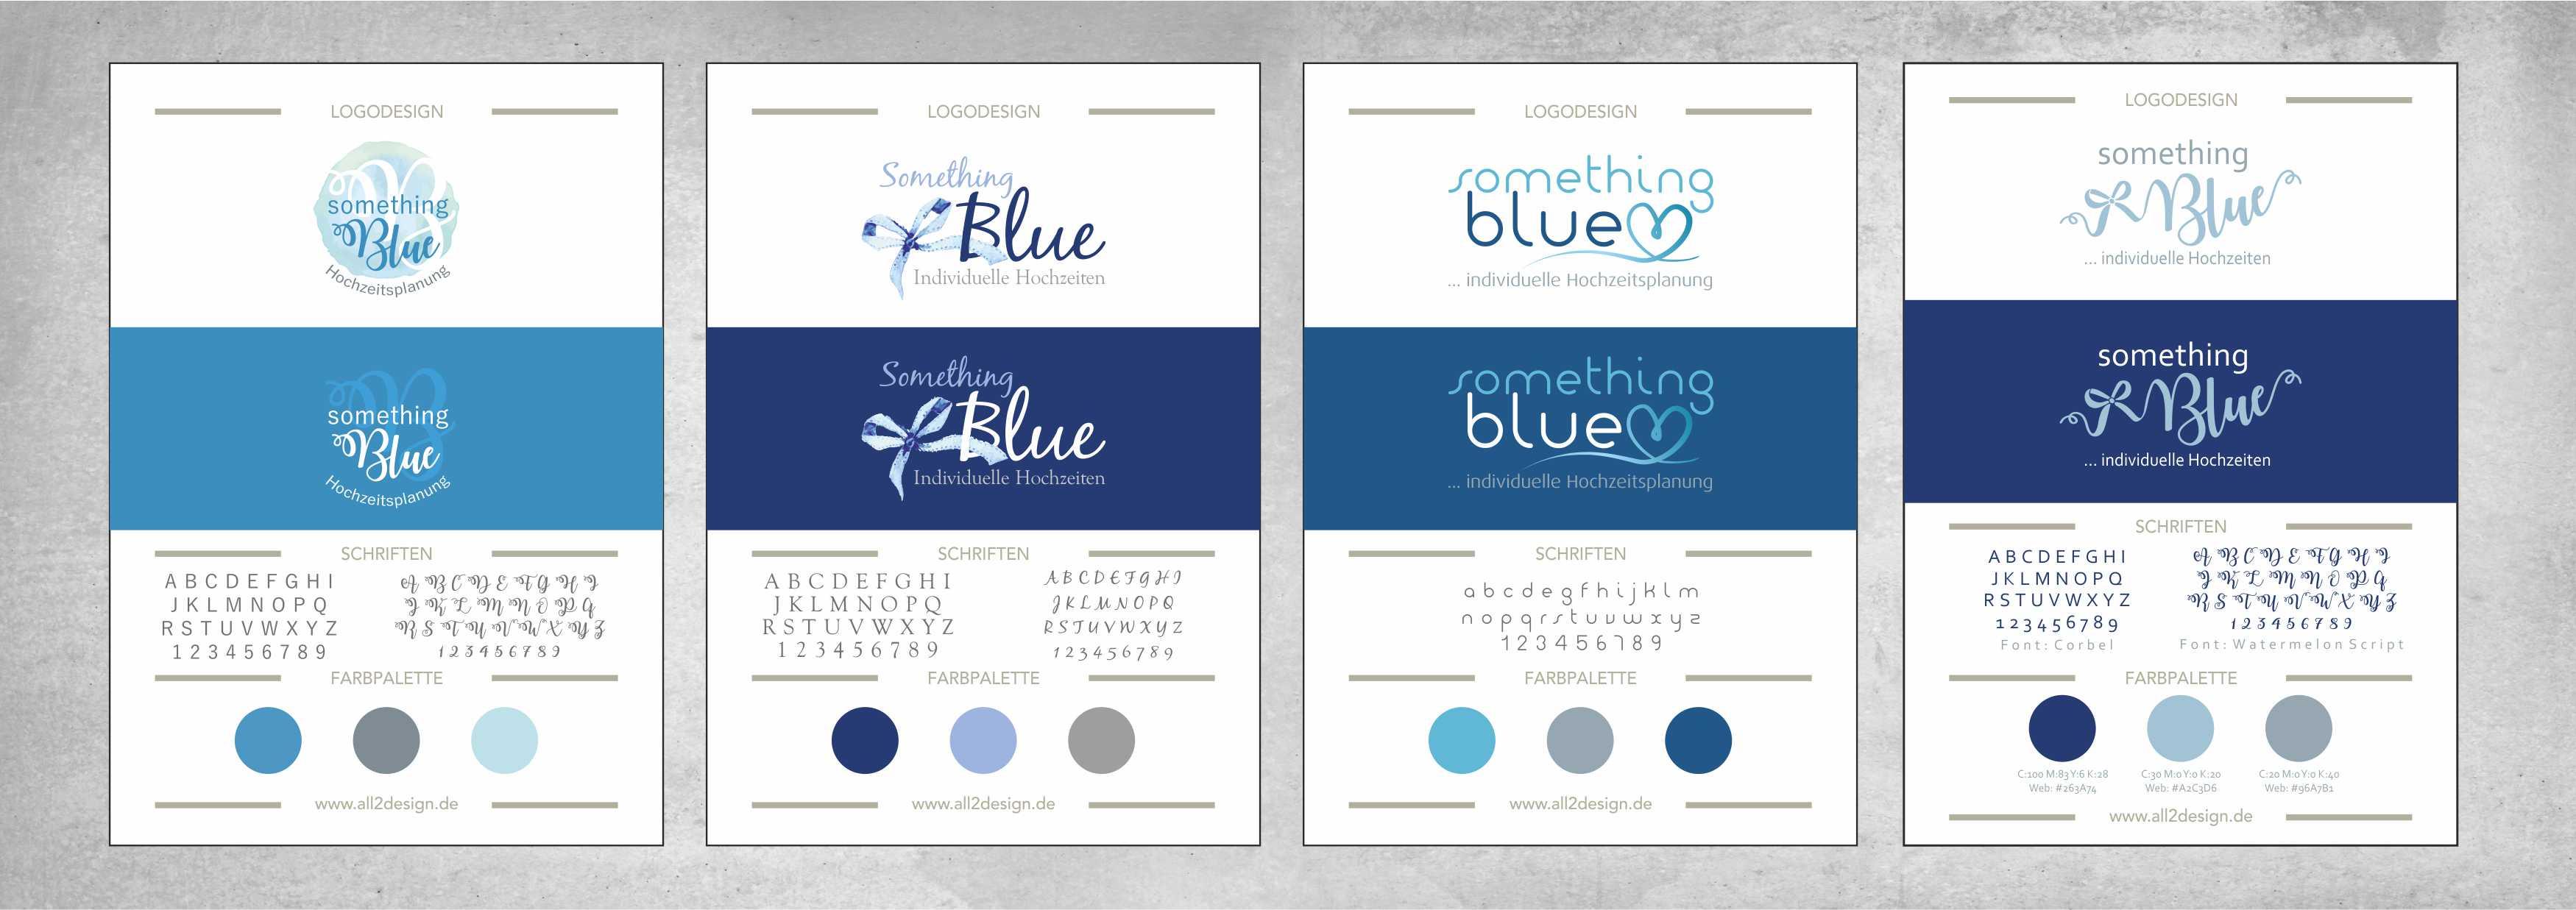 something Blue Hochzeitsplanung Logodesign all2design Laura Friedrich